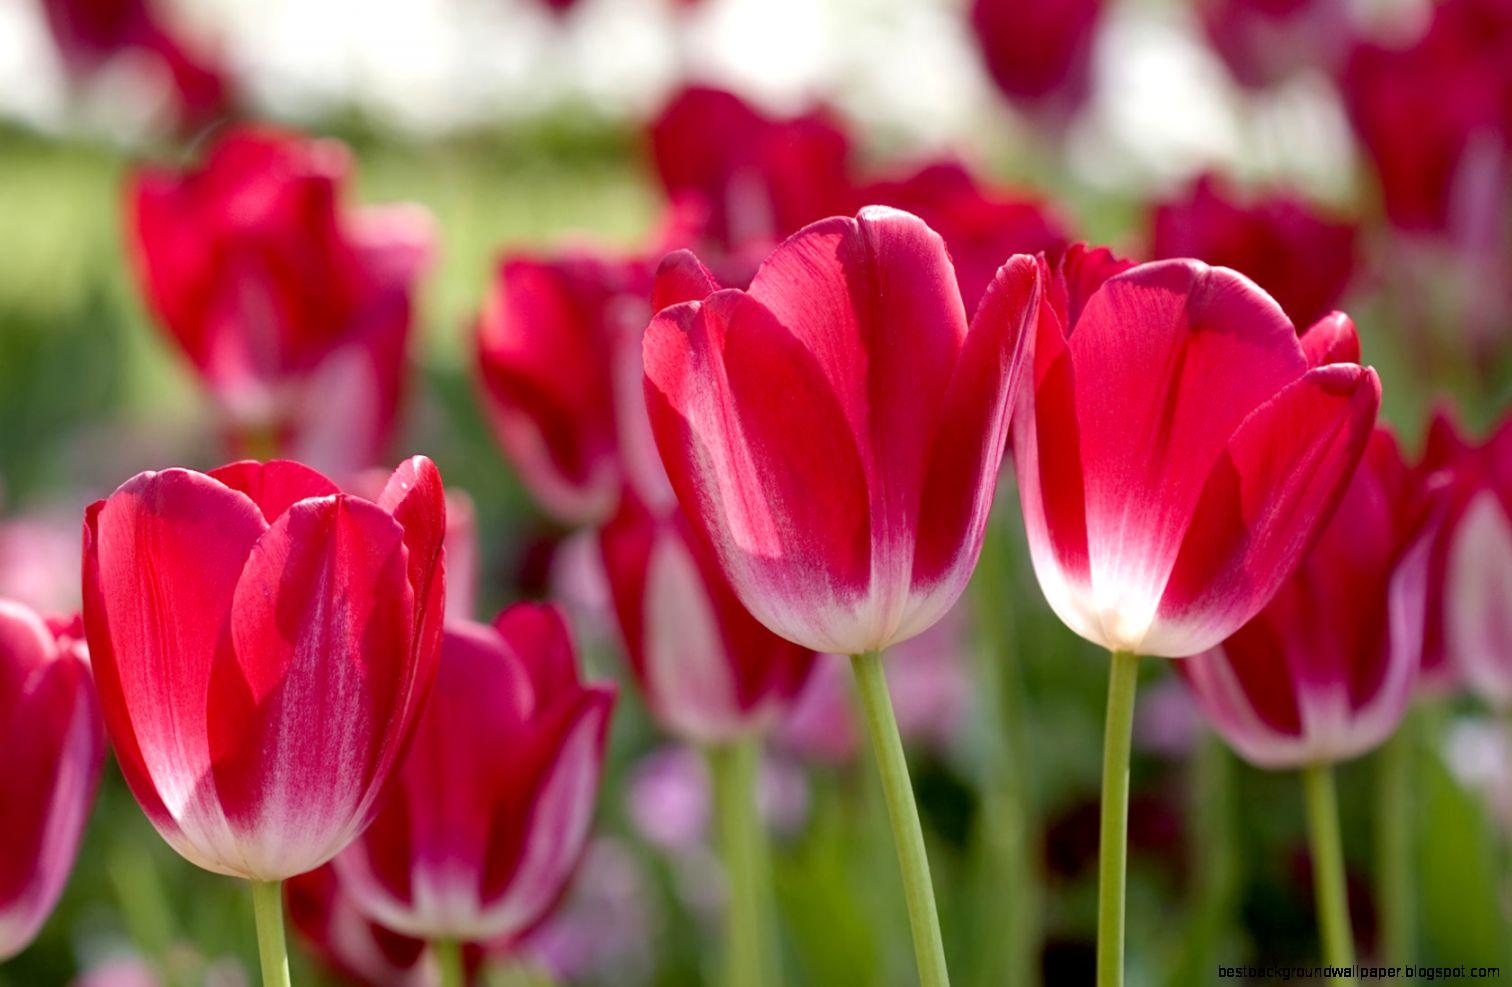 Spring flower screensavers downloads best background wallpaper view original size free screensavers and wallpaper spring flowers image source from this mightylinksfo